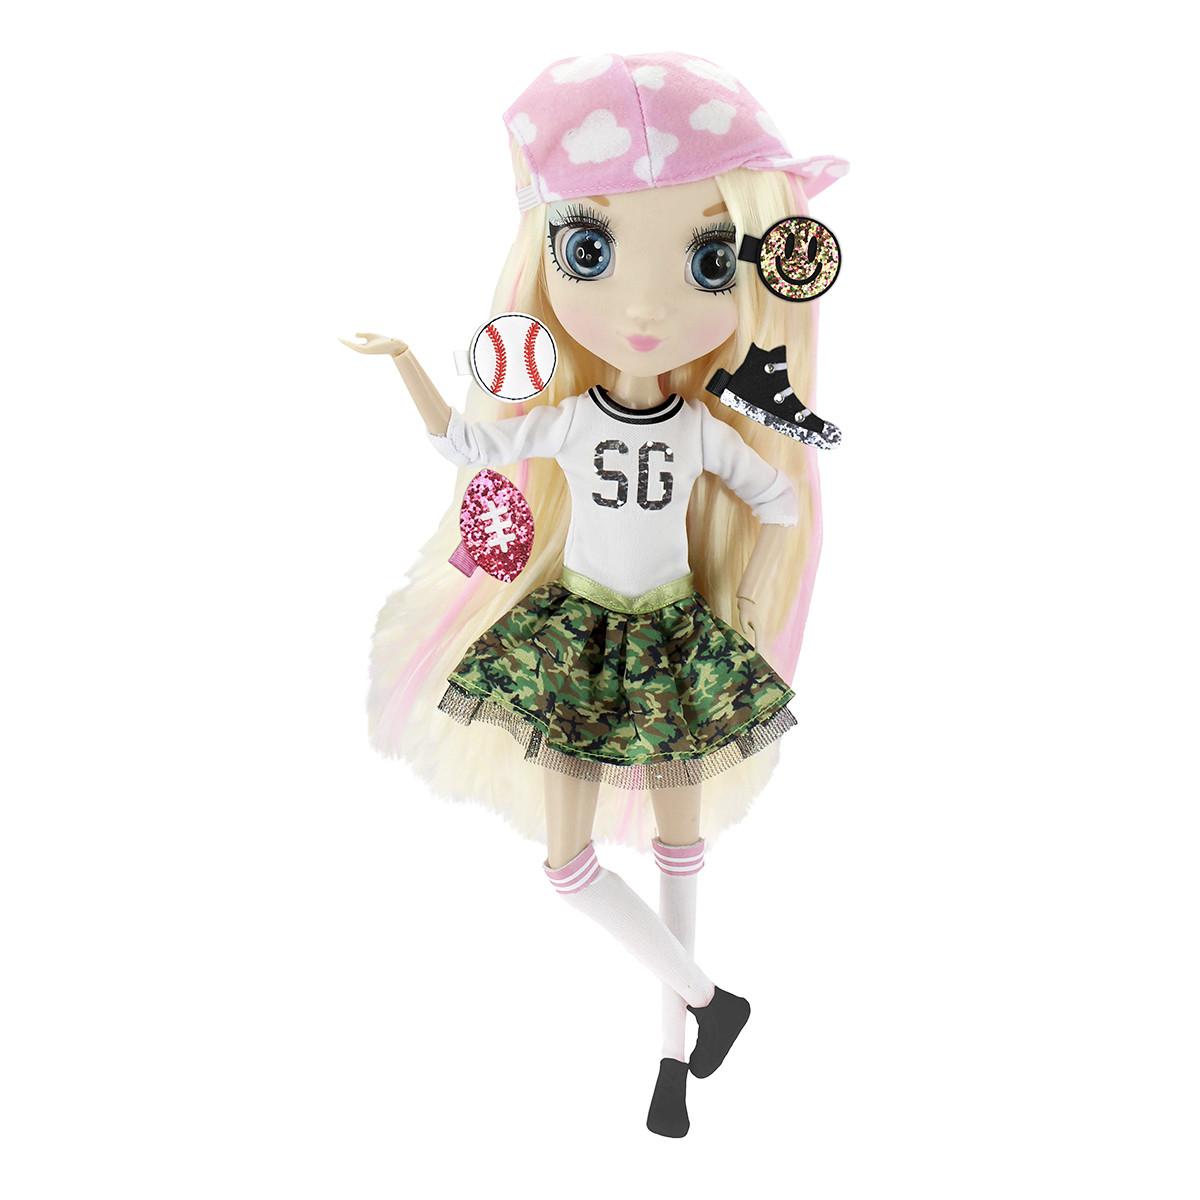 Кукла Shibajuku - Микки  33 см, 6 точек артикуляции, с аксессуарами